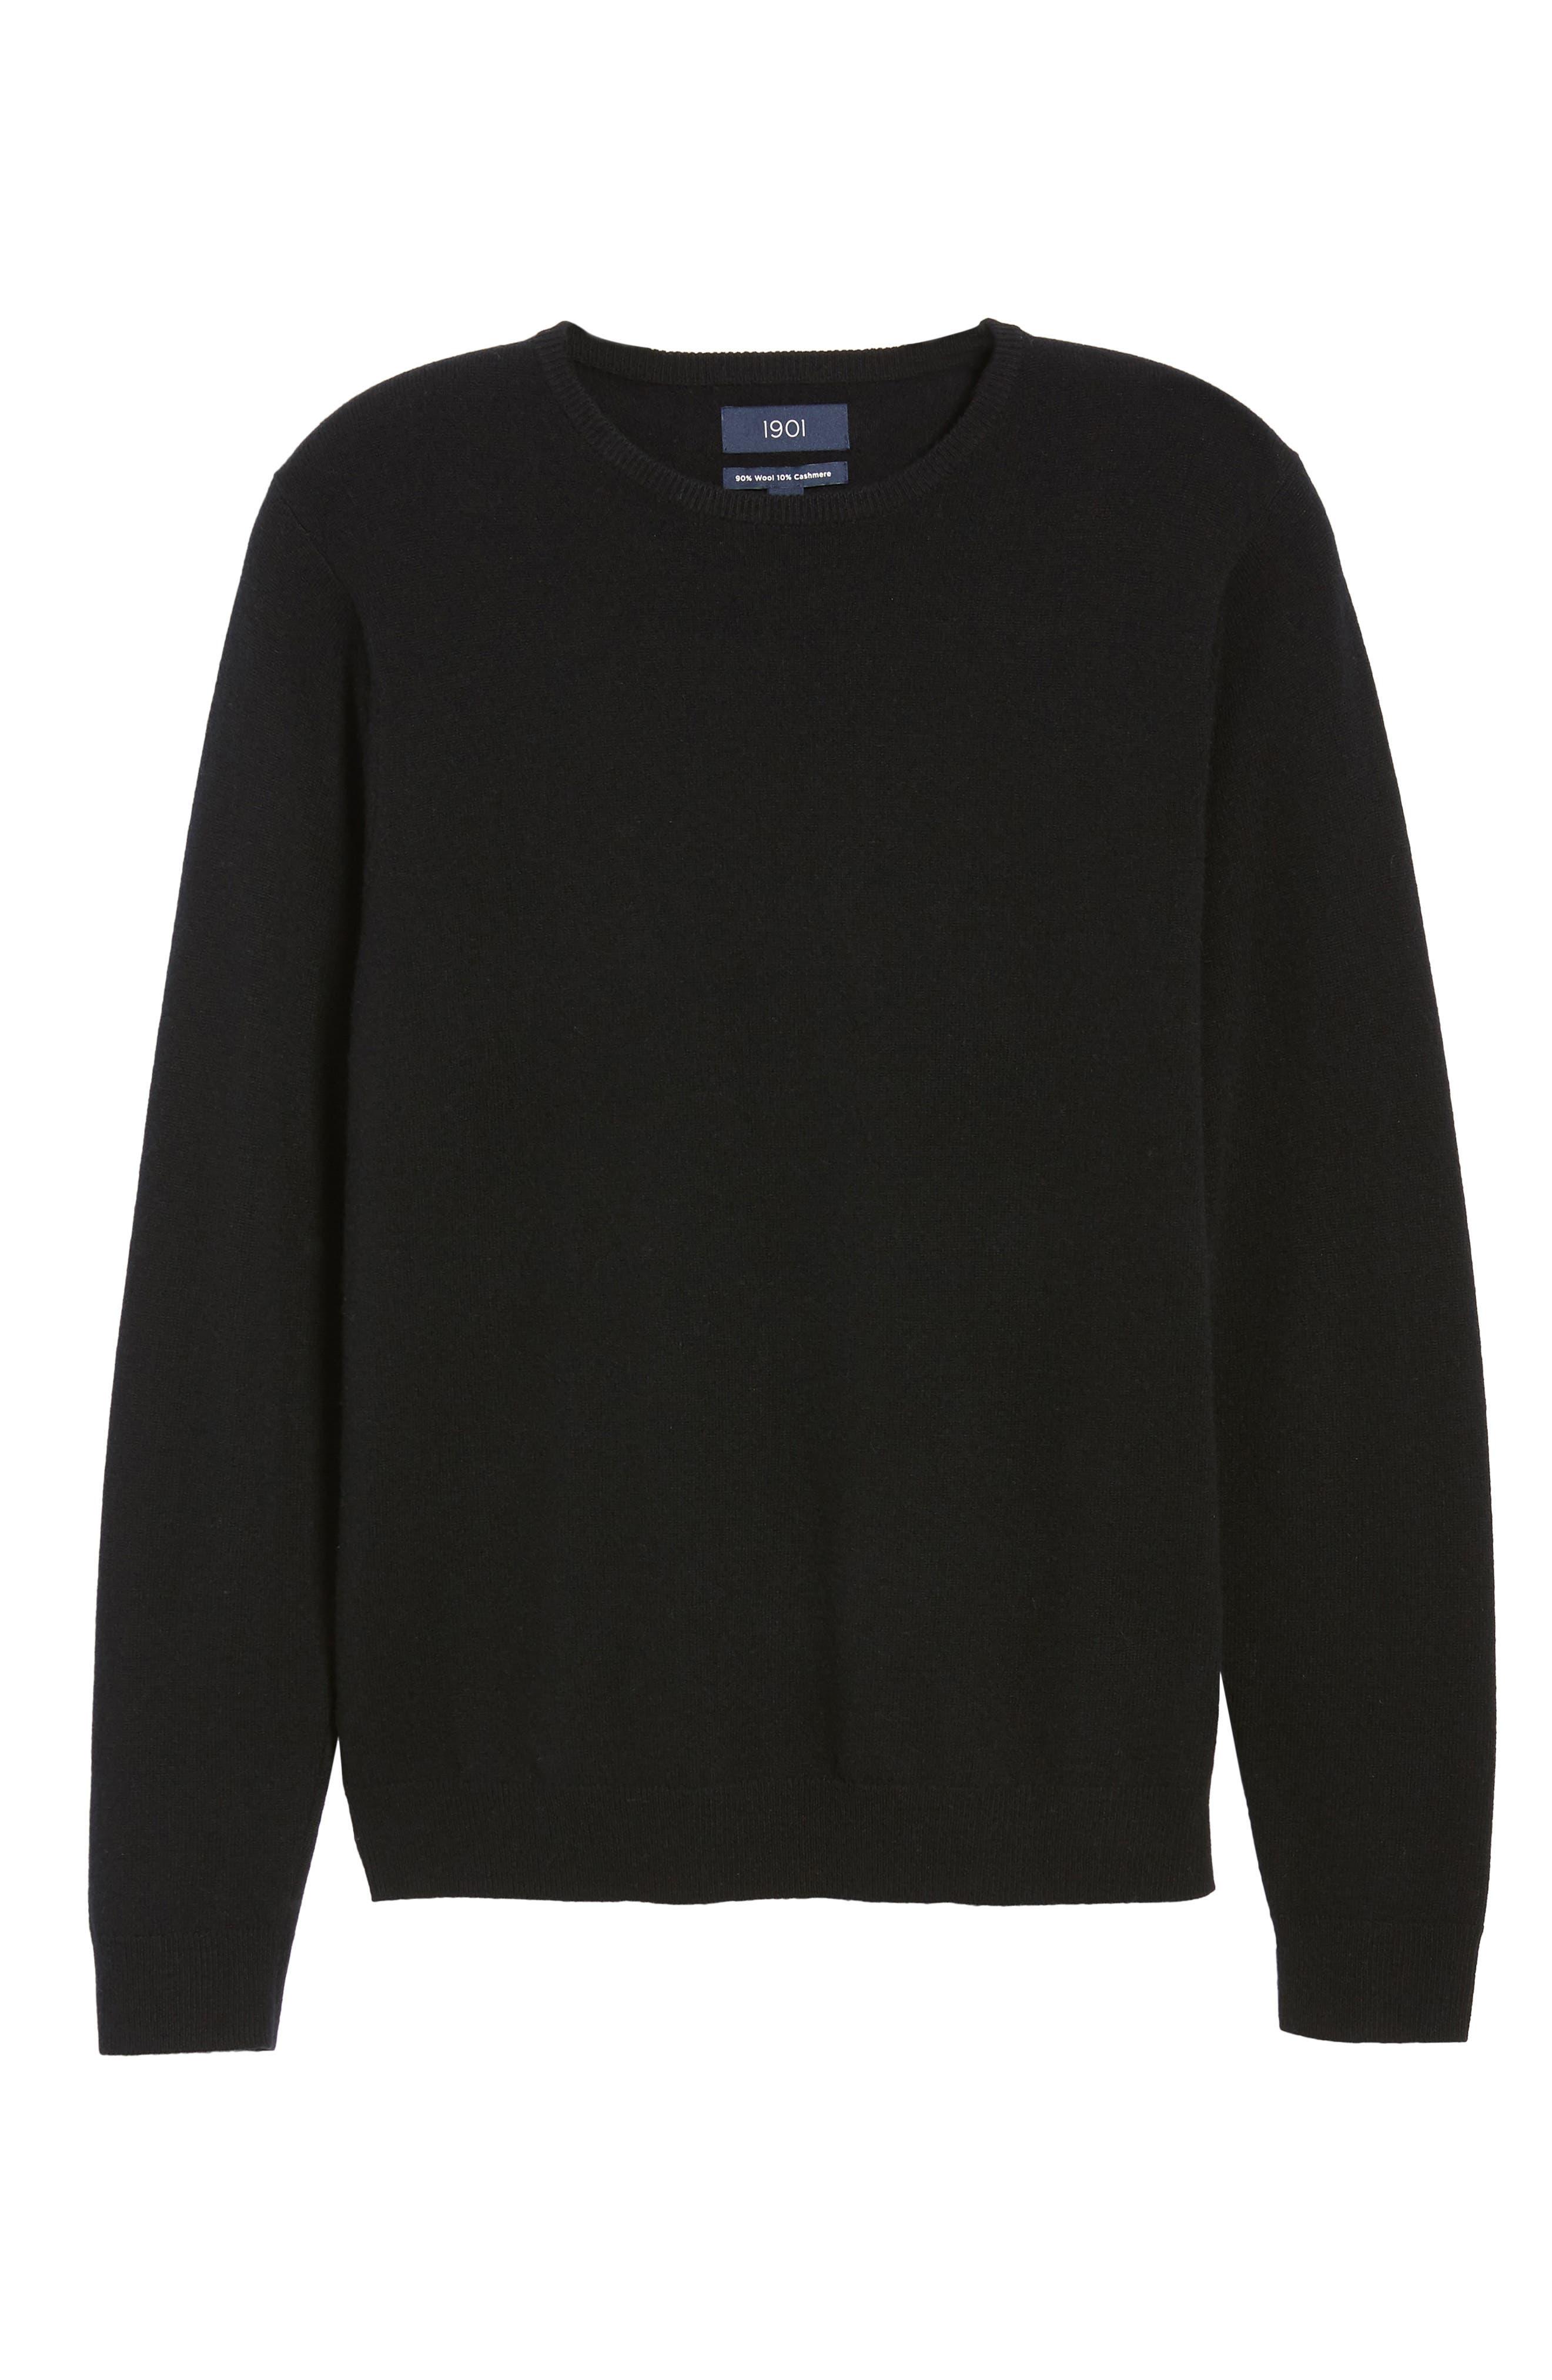 Regular Fit Wool & Cashmere Sweater,                             Alternate thumbnail 6, color,                             BLACK CAVIAR